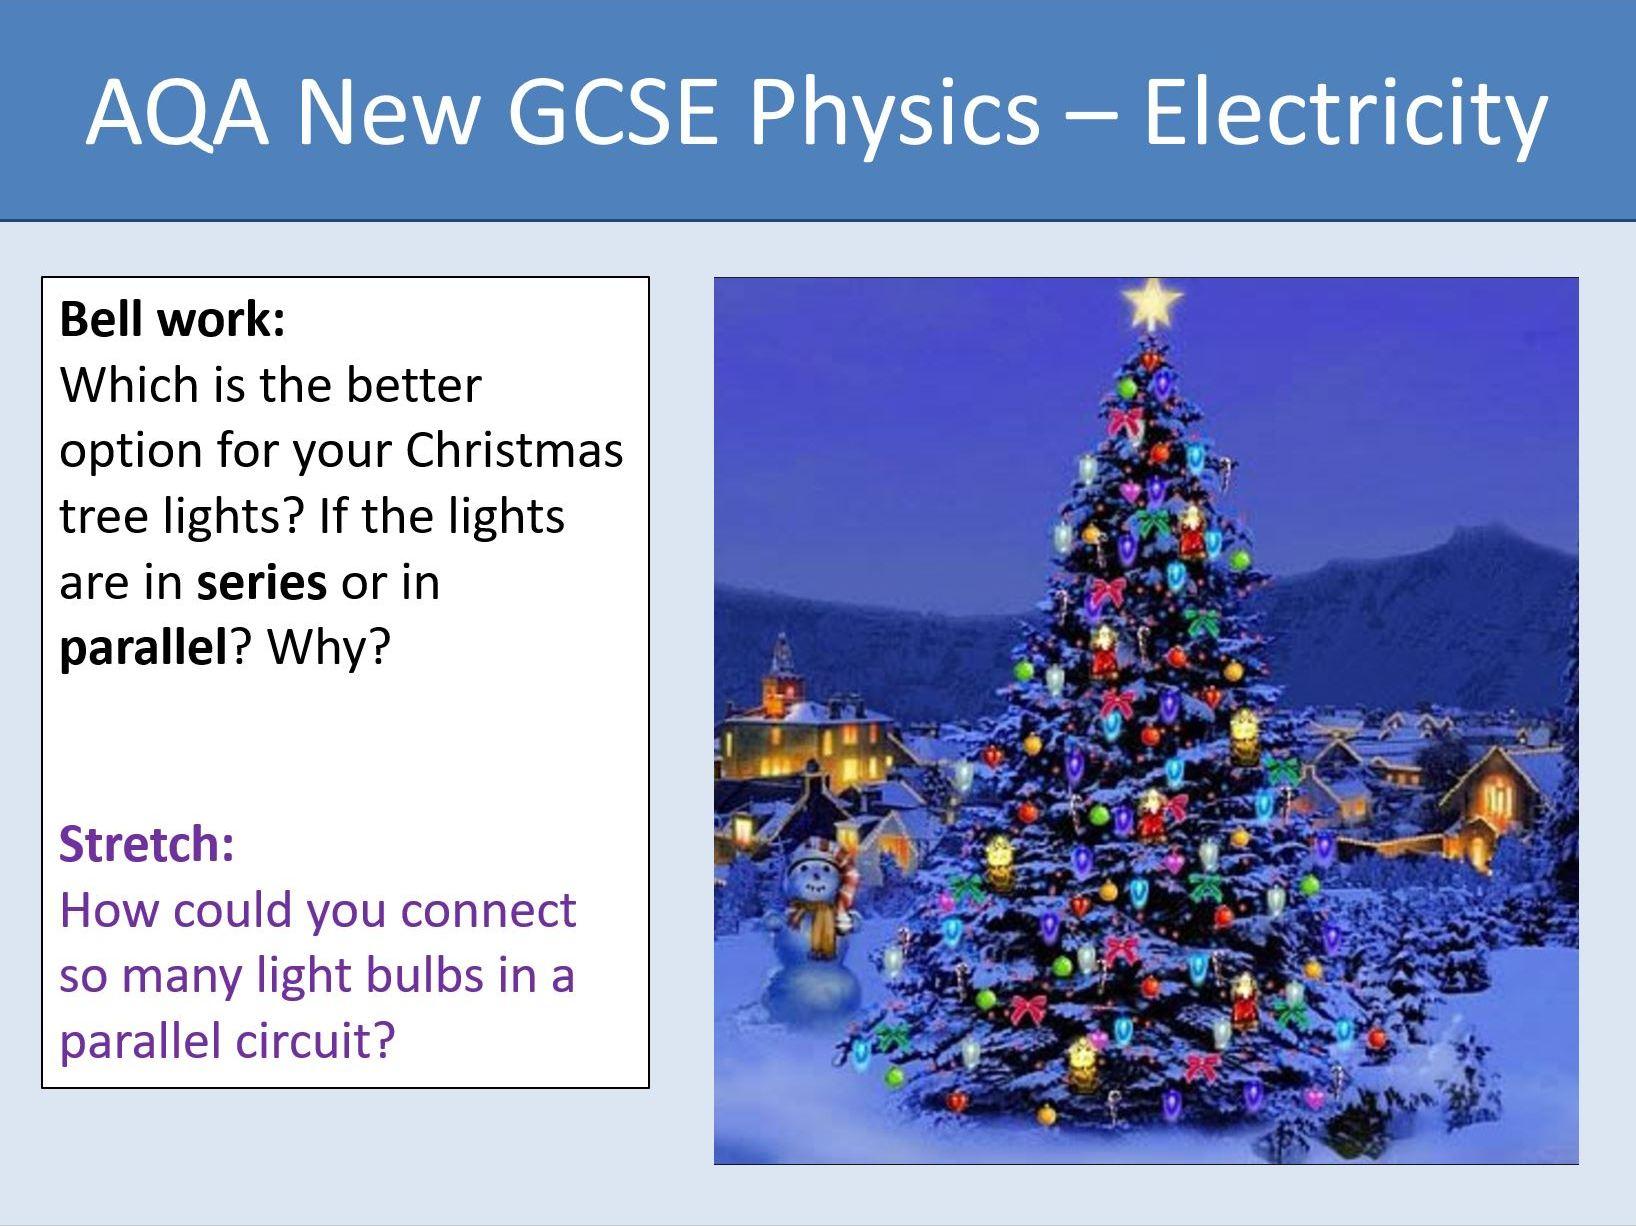 NEW AQA GCSE Physics - Electricity lesson bundle